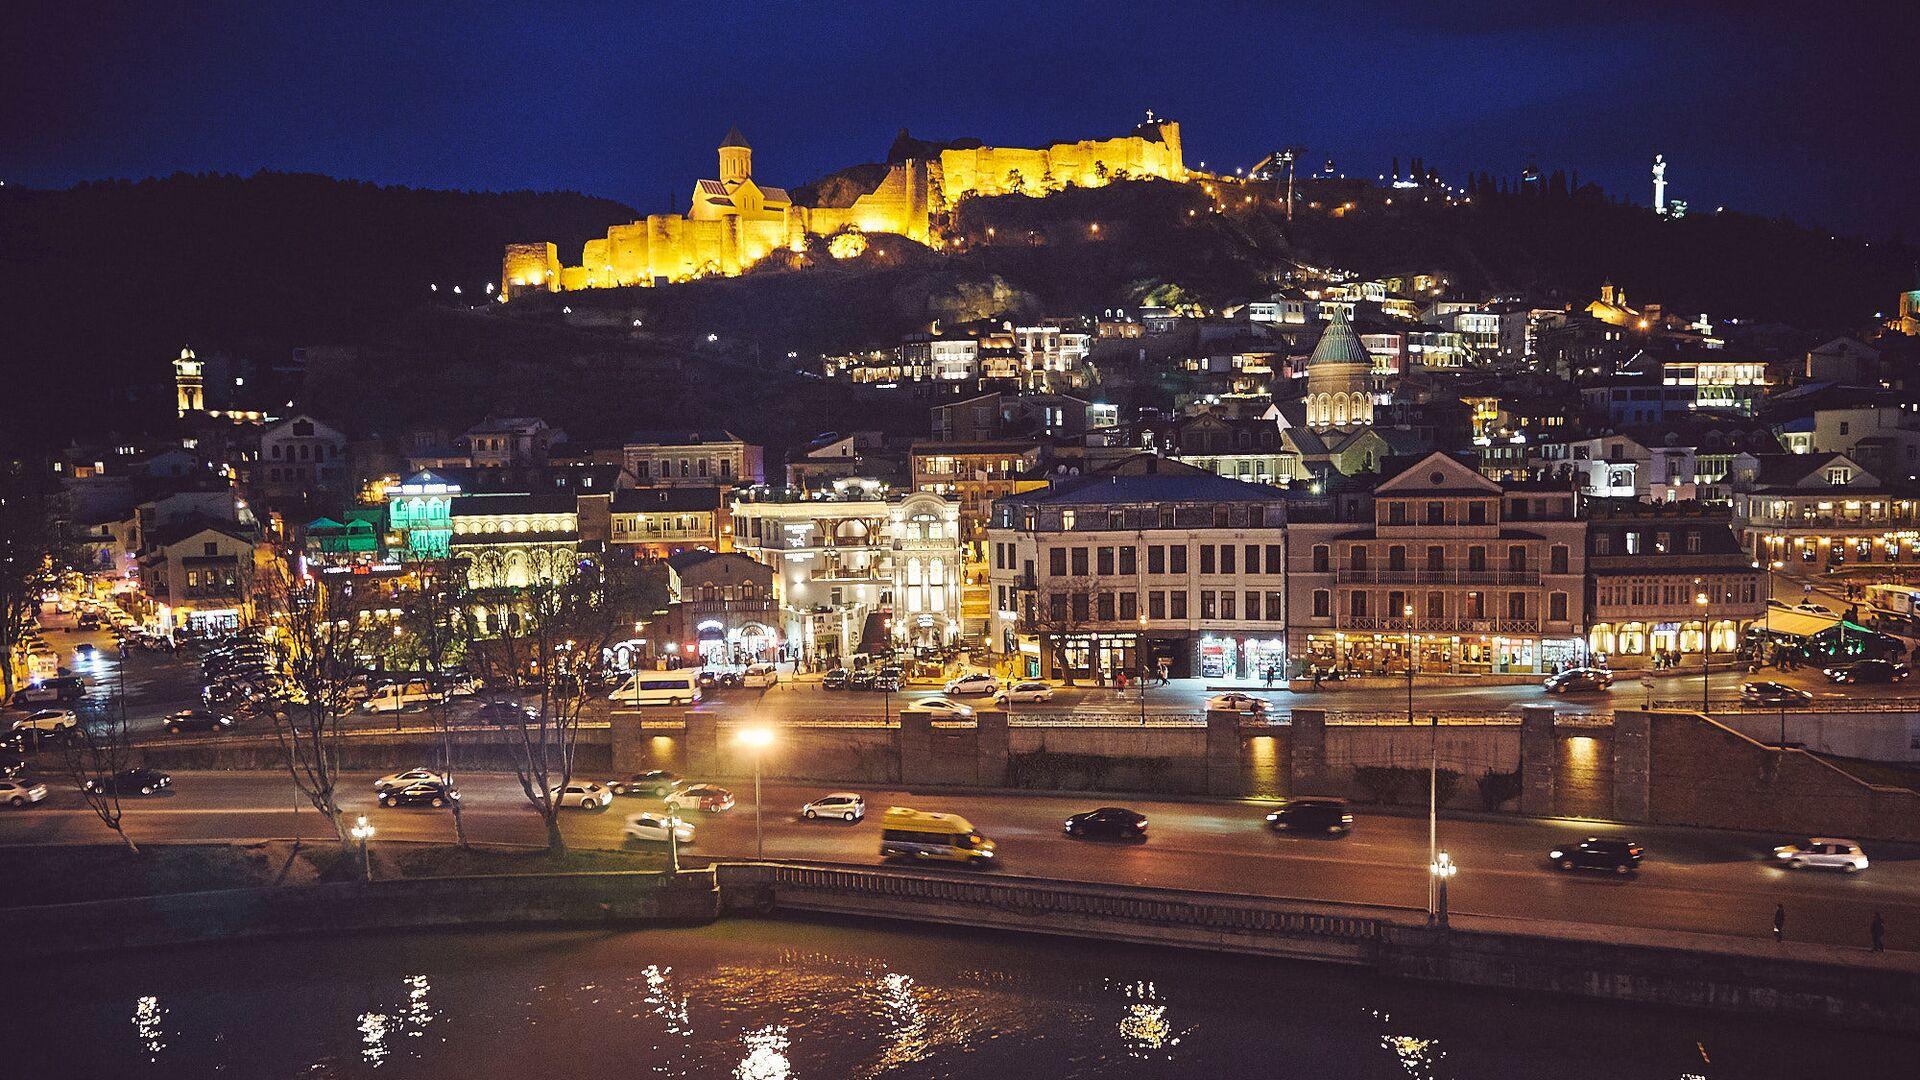 Вечерний Тбилиси - Нарикала, Мейдан, Кала убани. Старый город - Sputnik Грузия, 1920, 08.10.2021